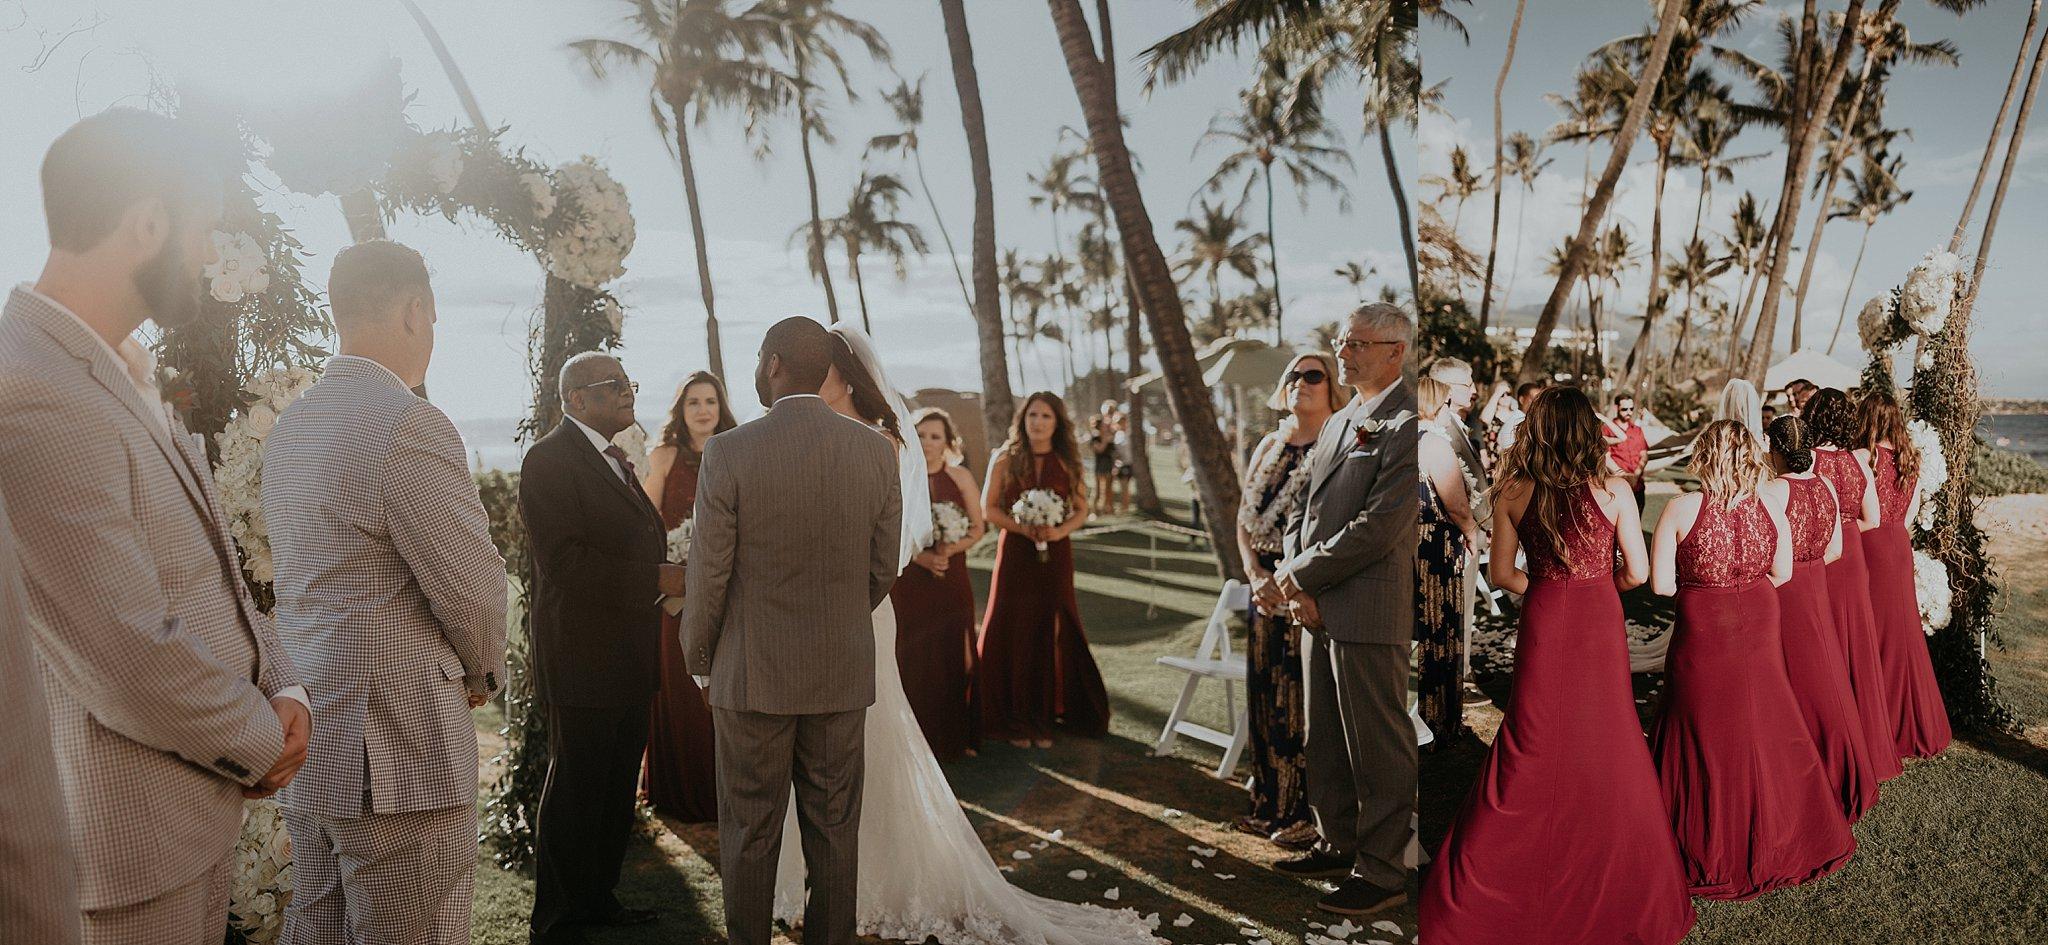 samantha_mcfarlen_bellingham_washington_engagement_photography_seattle_wedding_photographer_0206.jpg